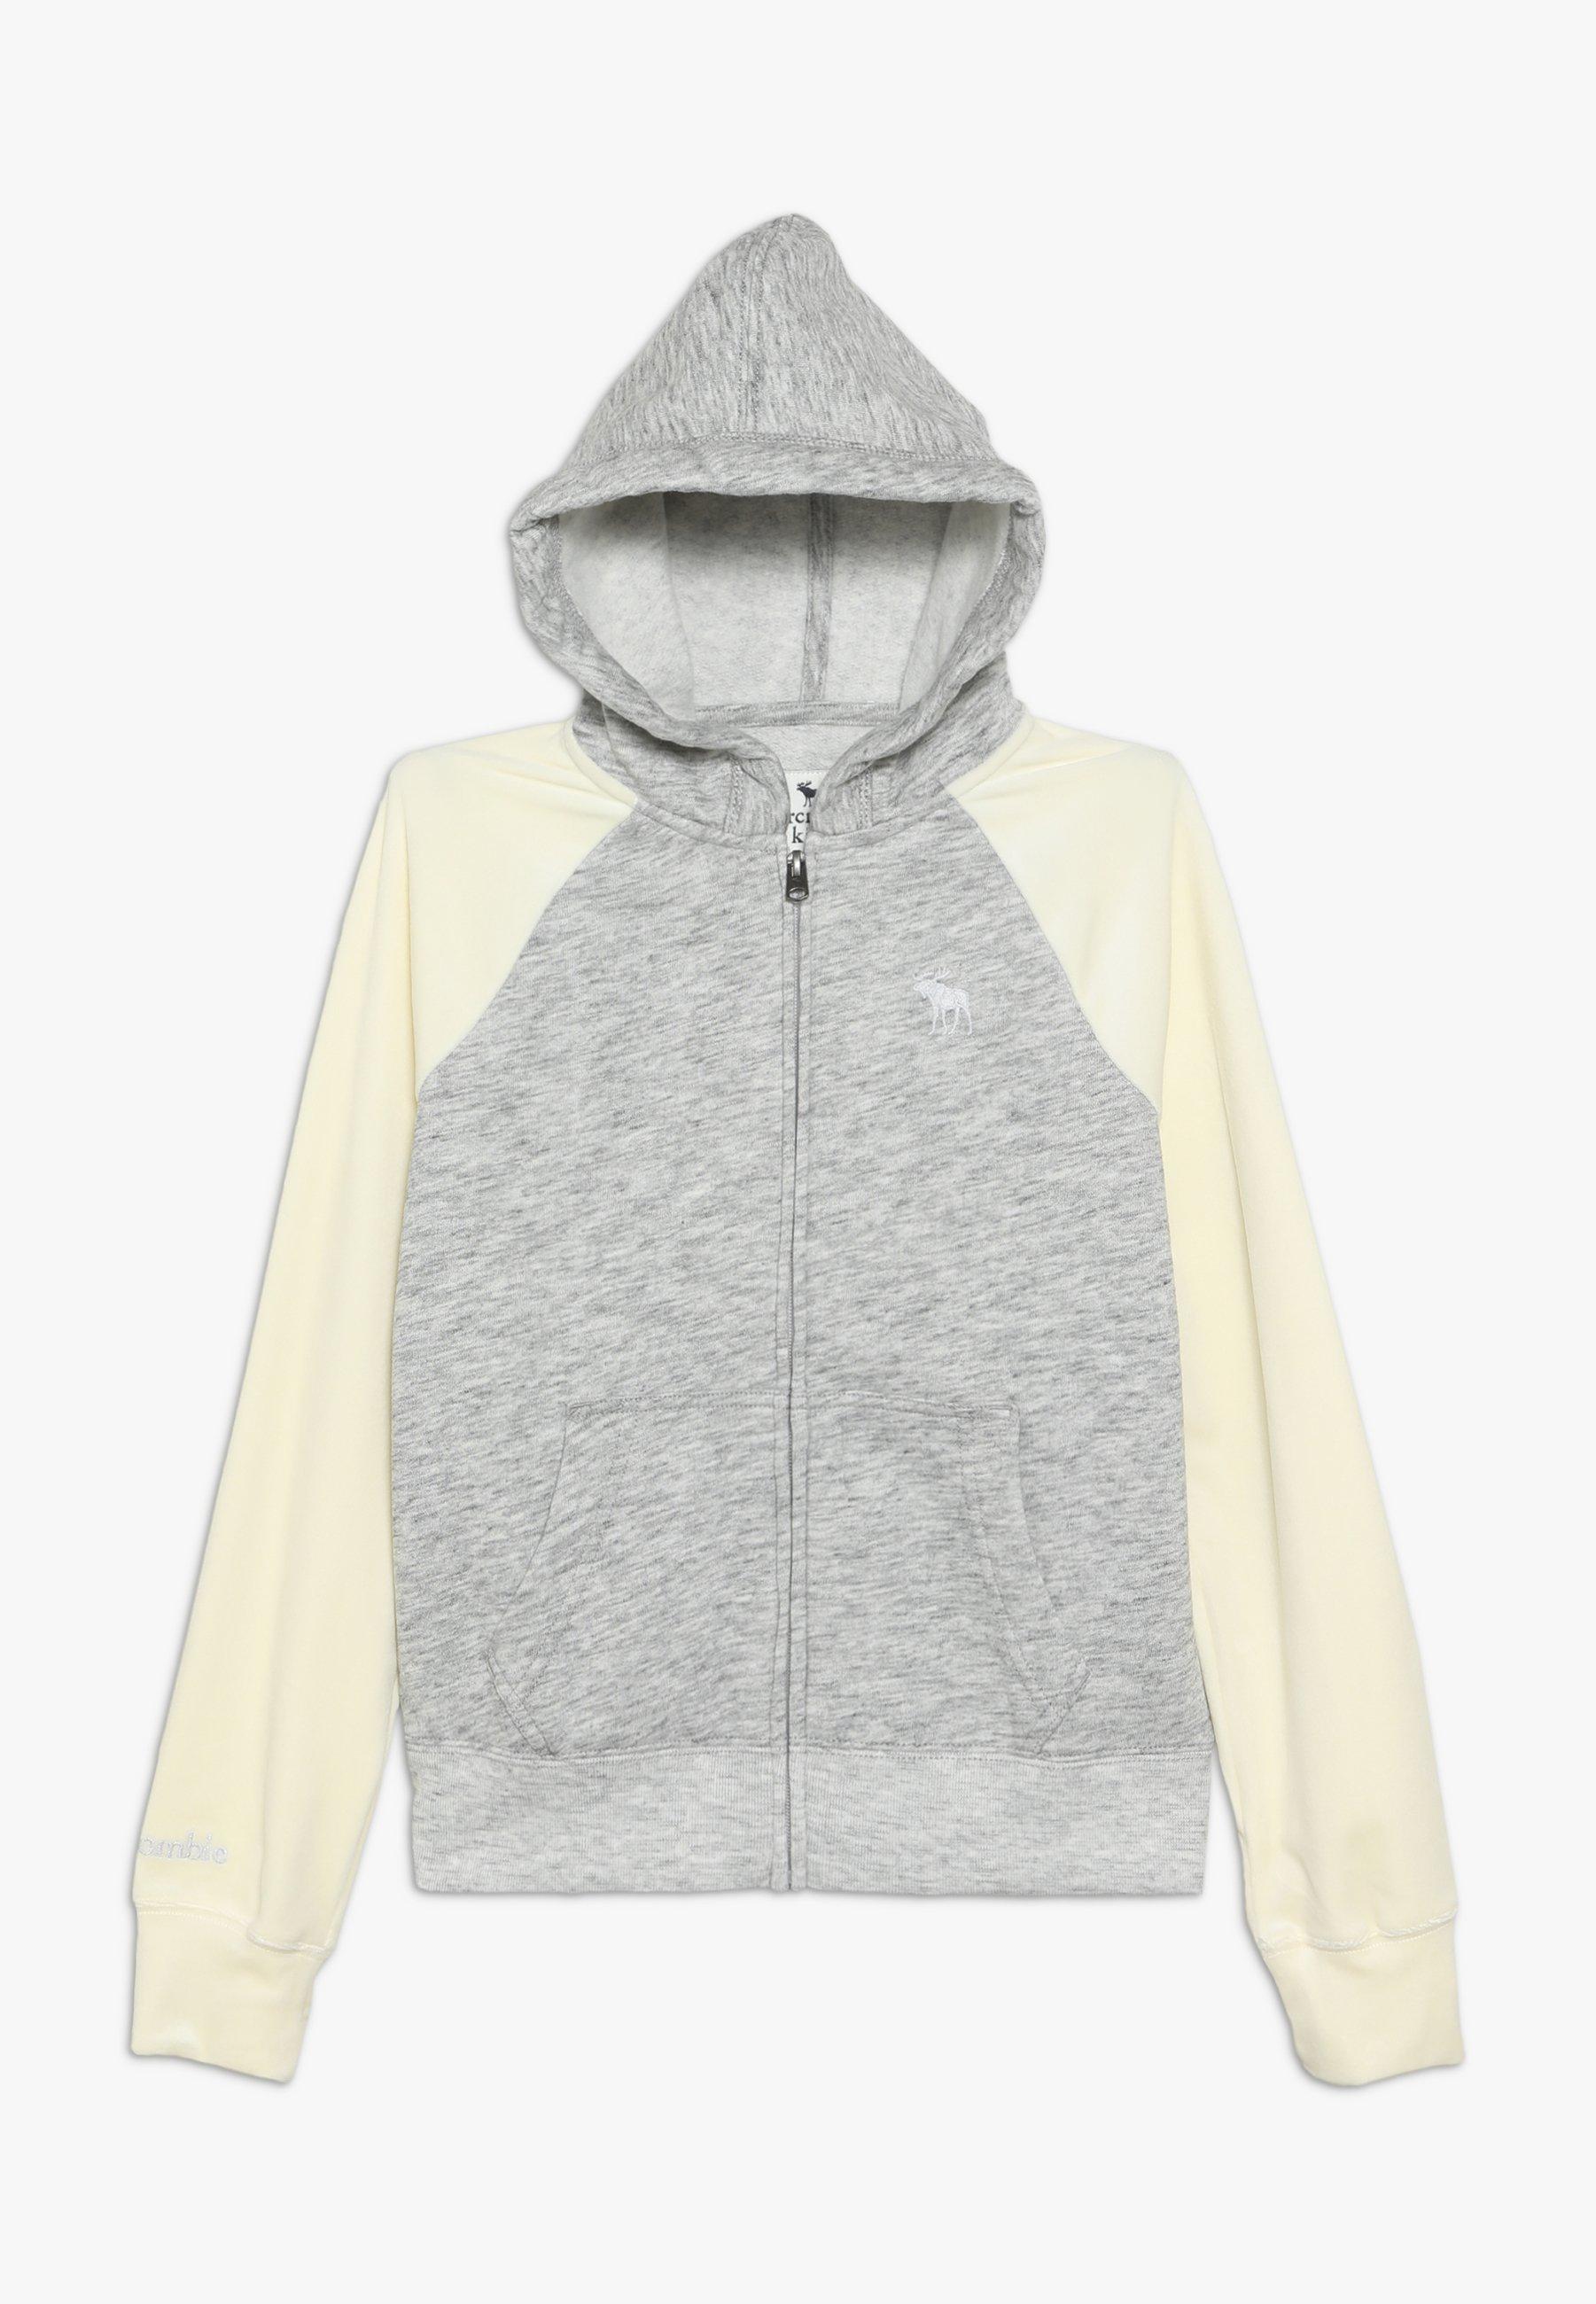 Große Förderung Abercrombie & Fitch CORE - Sweatjacke - grey | Damenbekleidung 2020